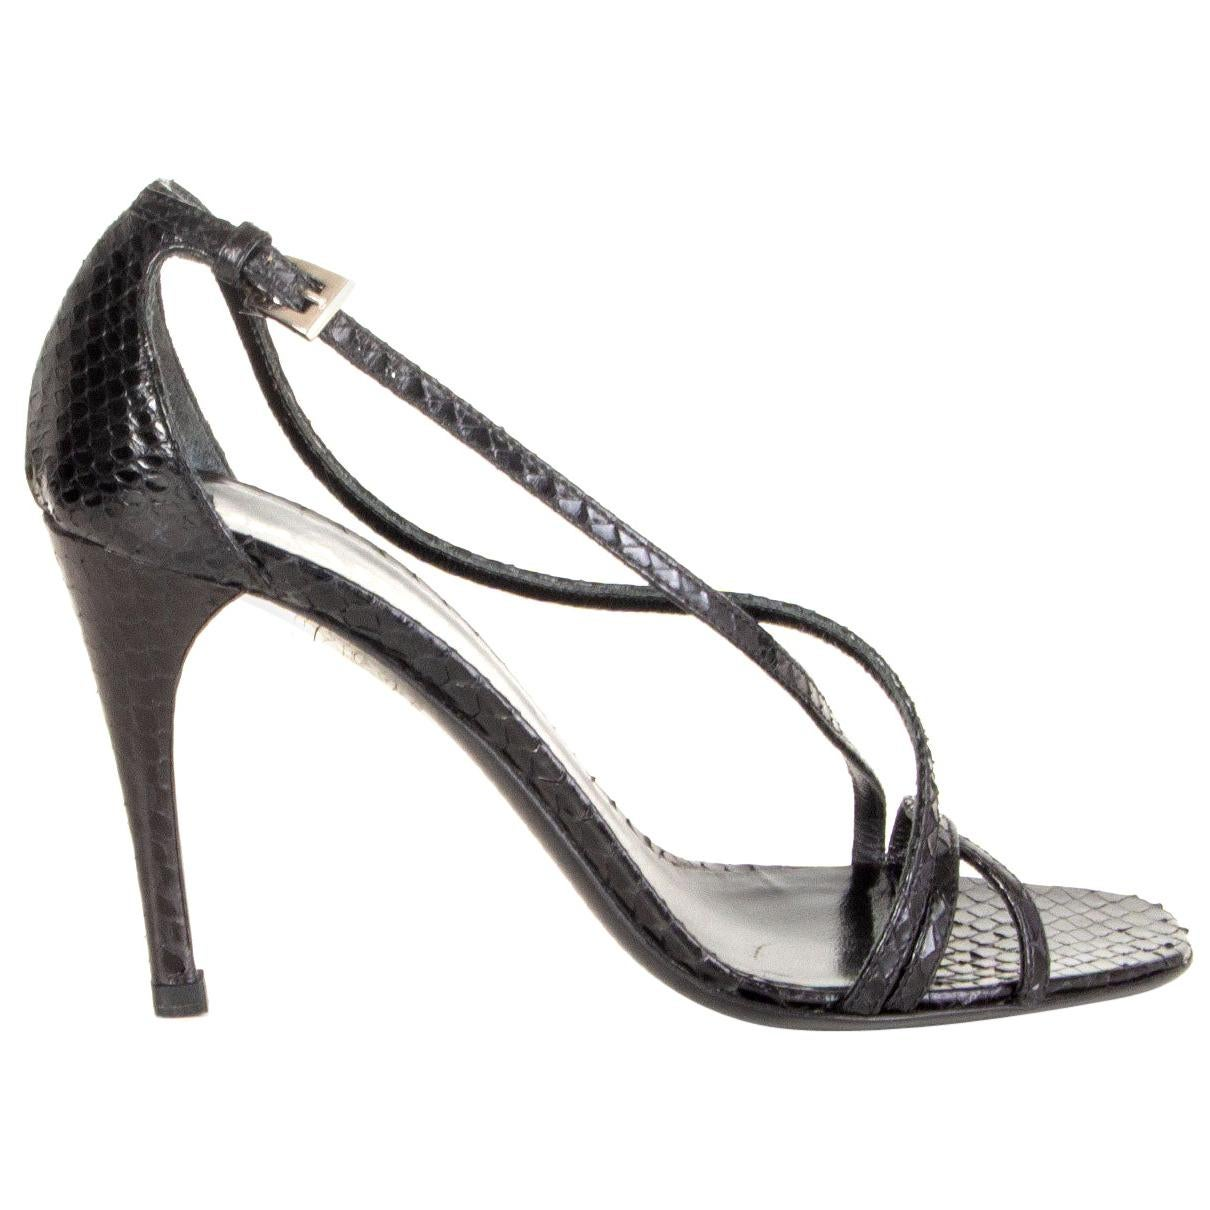 PRADA black snakeskin leather Sandals Shoes 35.5